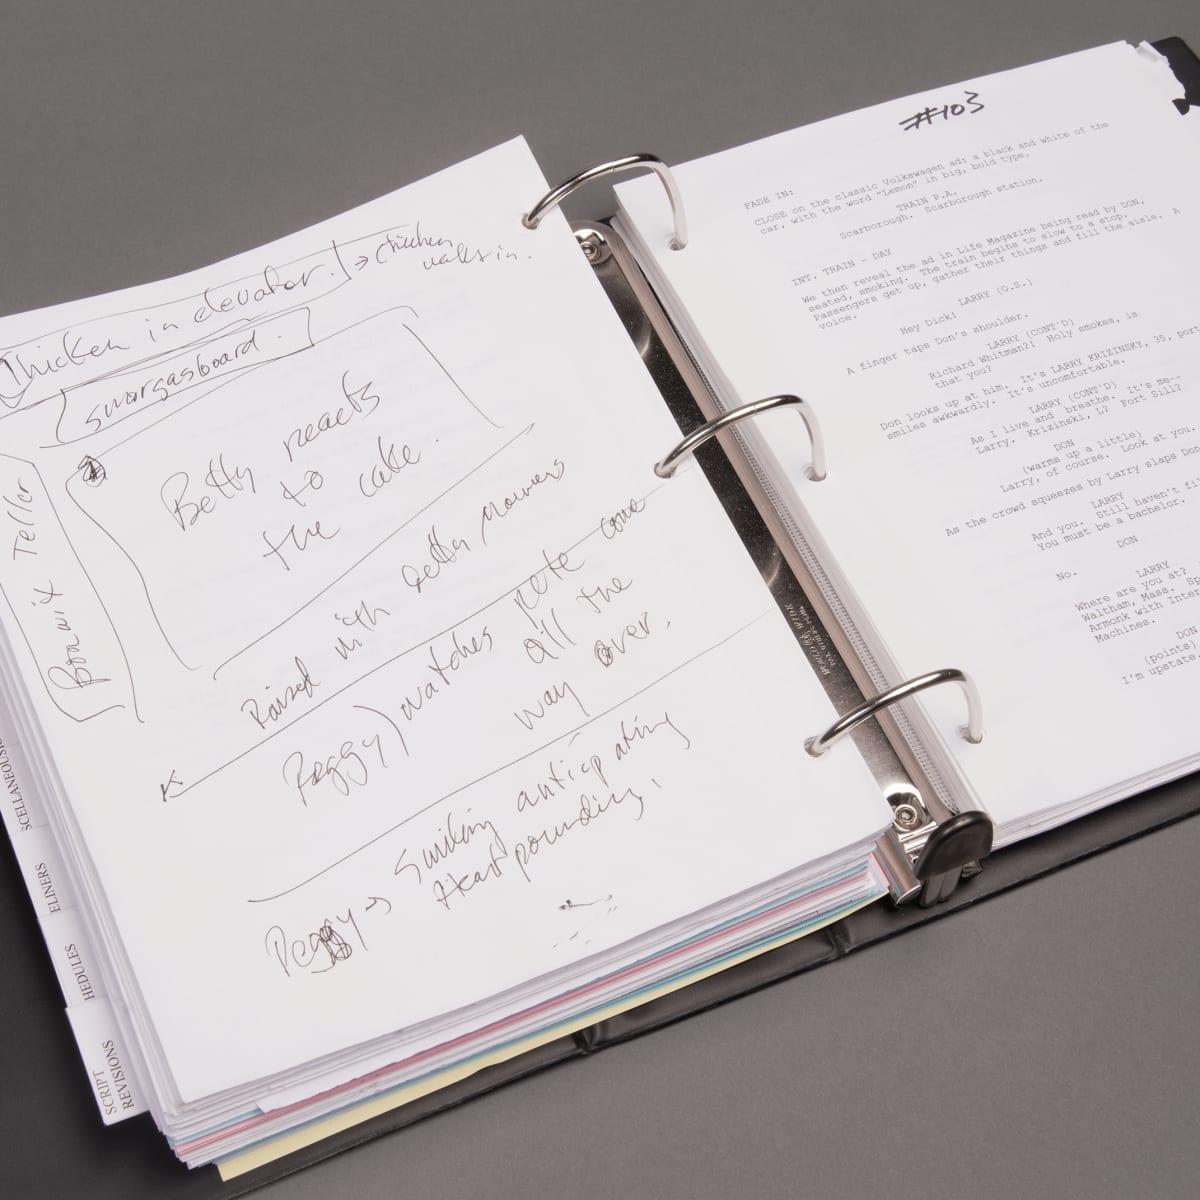 Mad Men archive Harry Ransom Center Matthew Weiner script The Marriage of Figaro